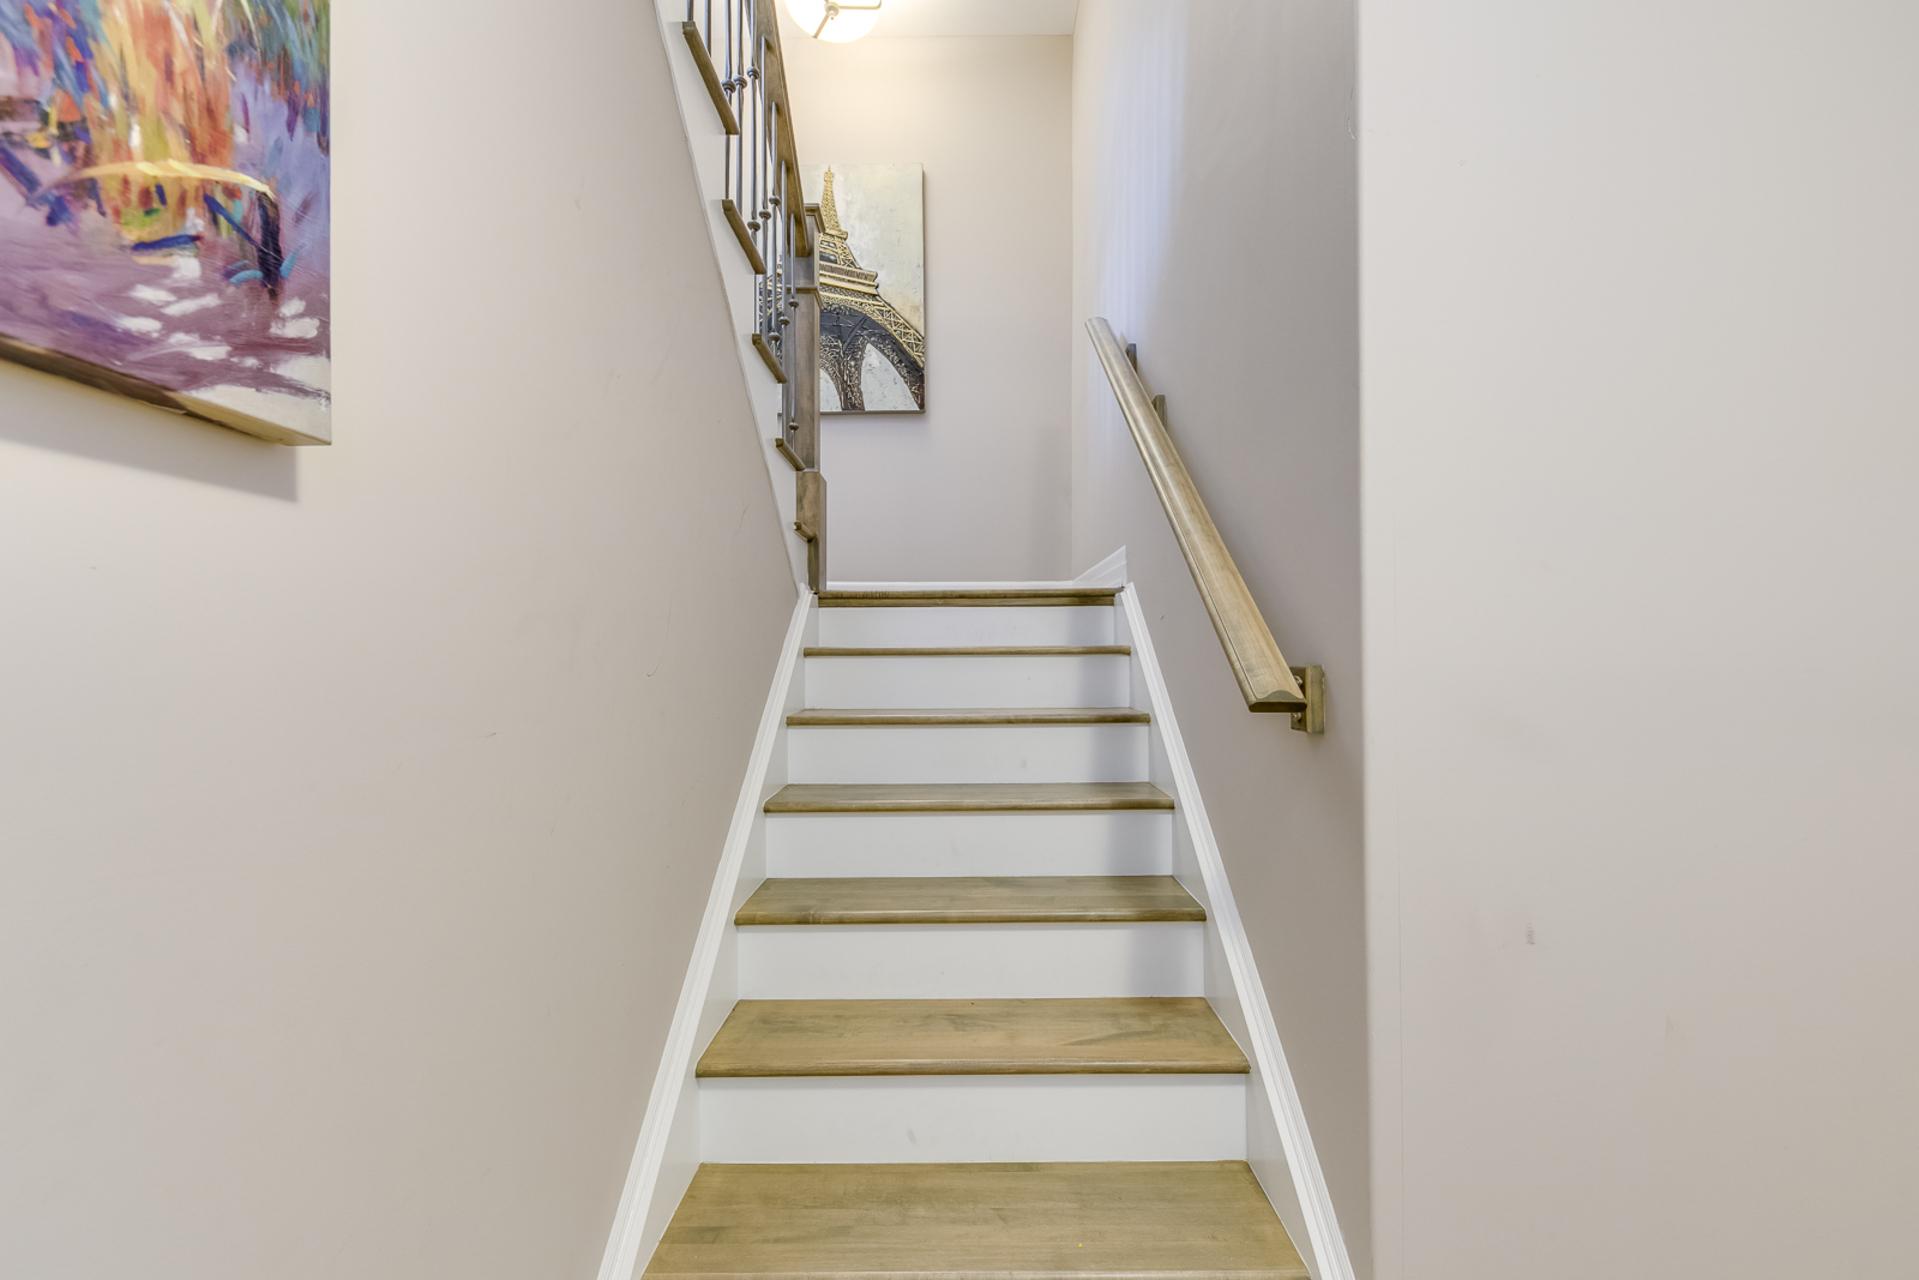 Basement Stairs - 73 North Park Blvd, Oakville - Elite3 & Team at 73 North Park Boulevard, Rural Oakville, Oakville